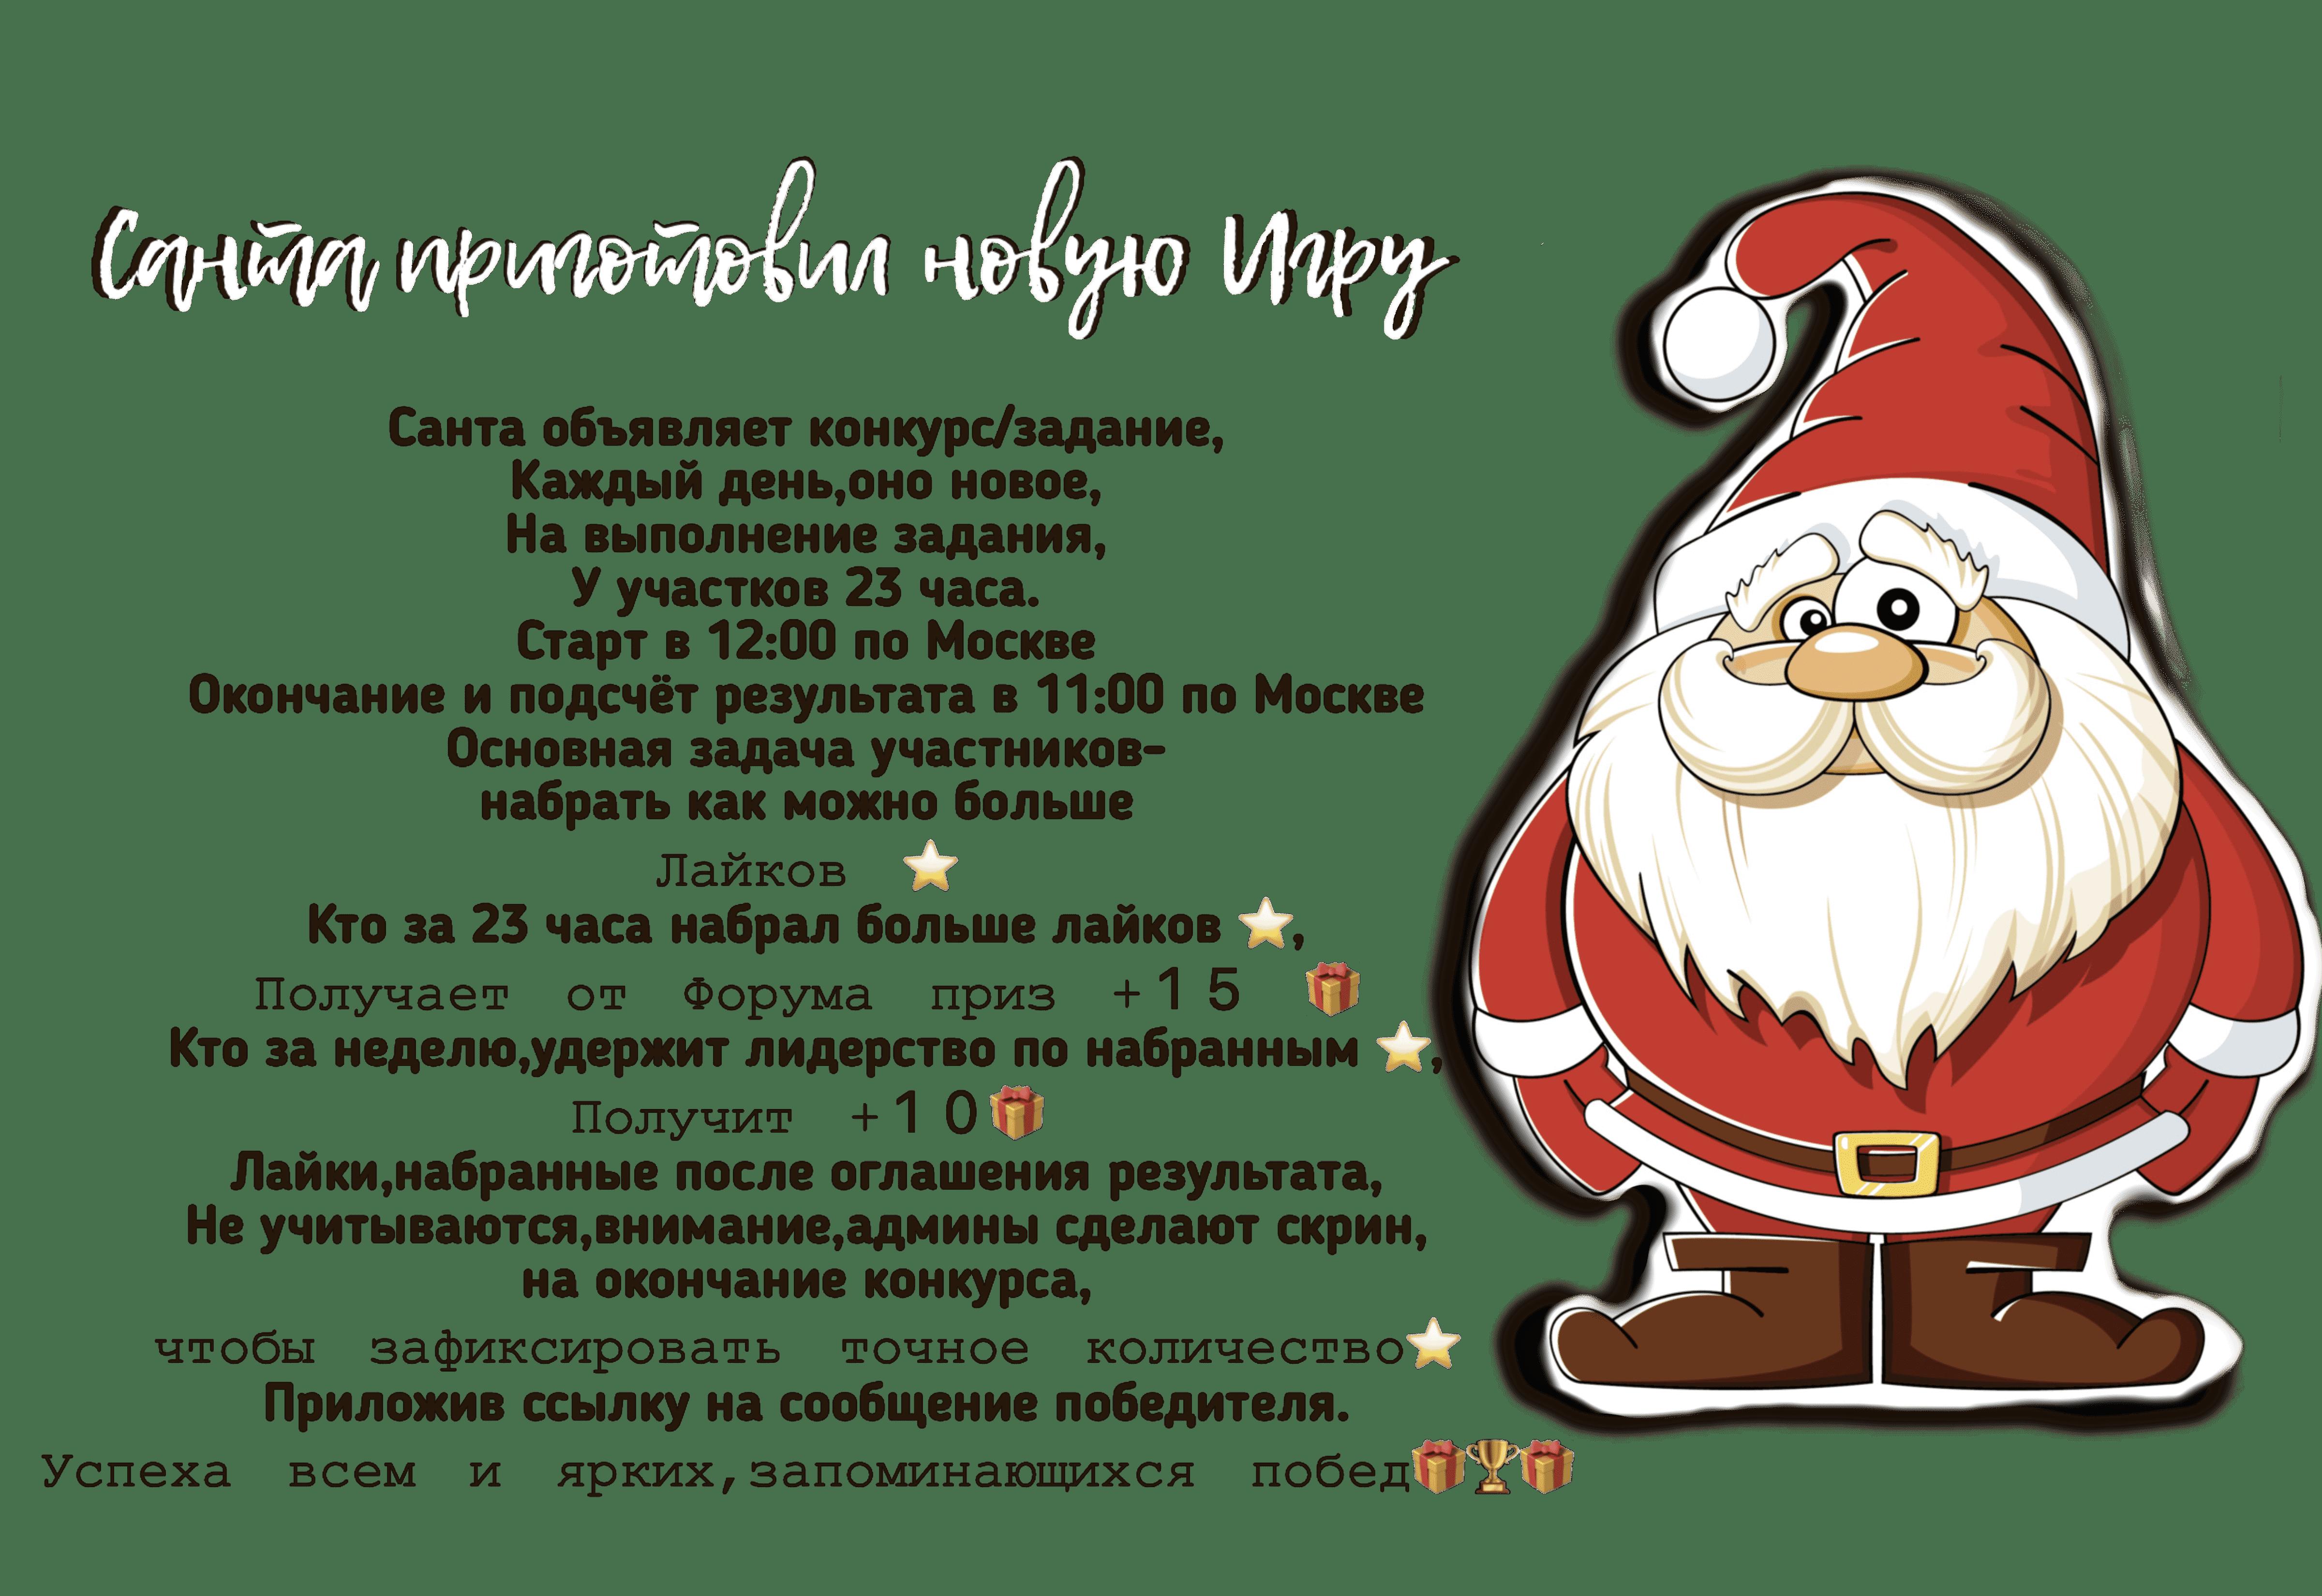 https://i2.imageban.ru/out/2020/02/11/2961c7015bbbffc629e442c41f4126a9.png